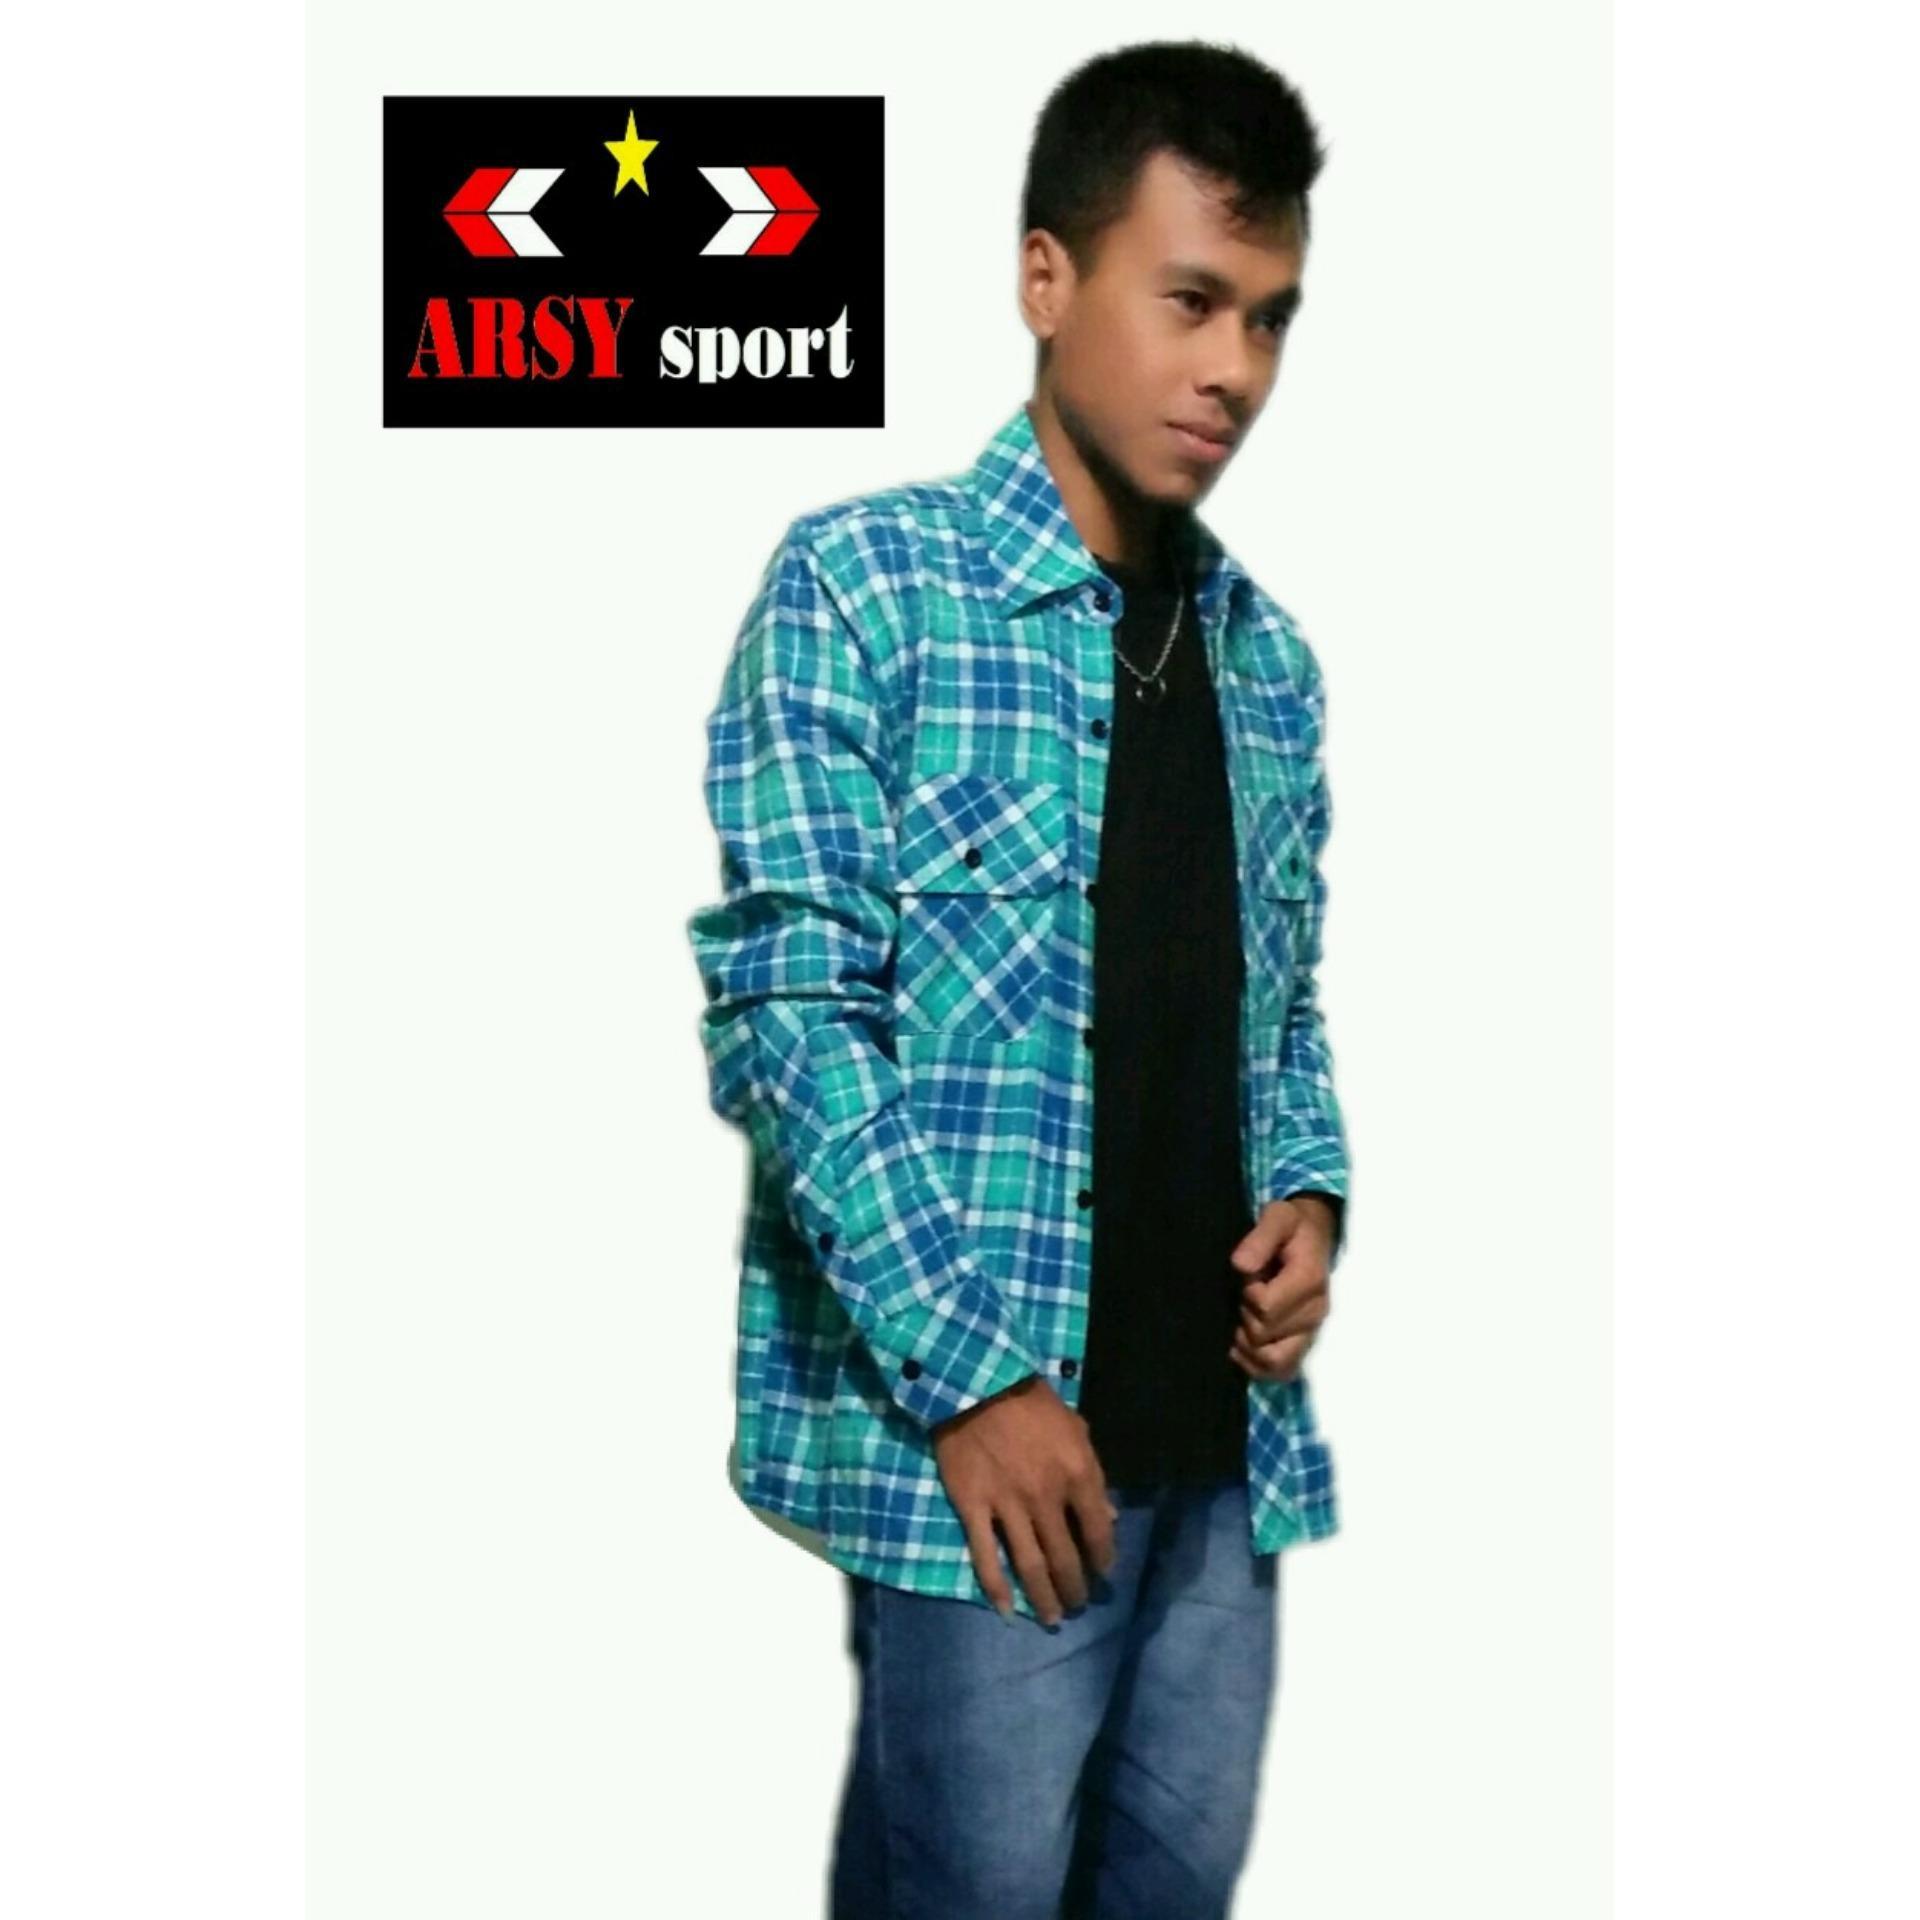 Harga Arsy Sport Kemeja Flanel Kotak Pria Di Jawa Barat